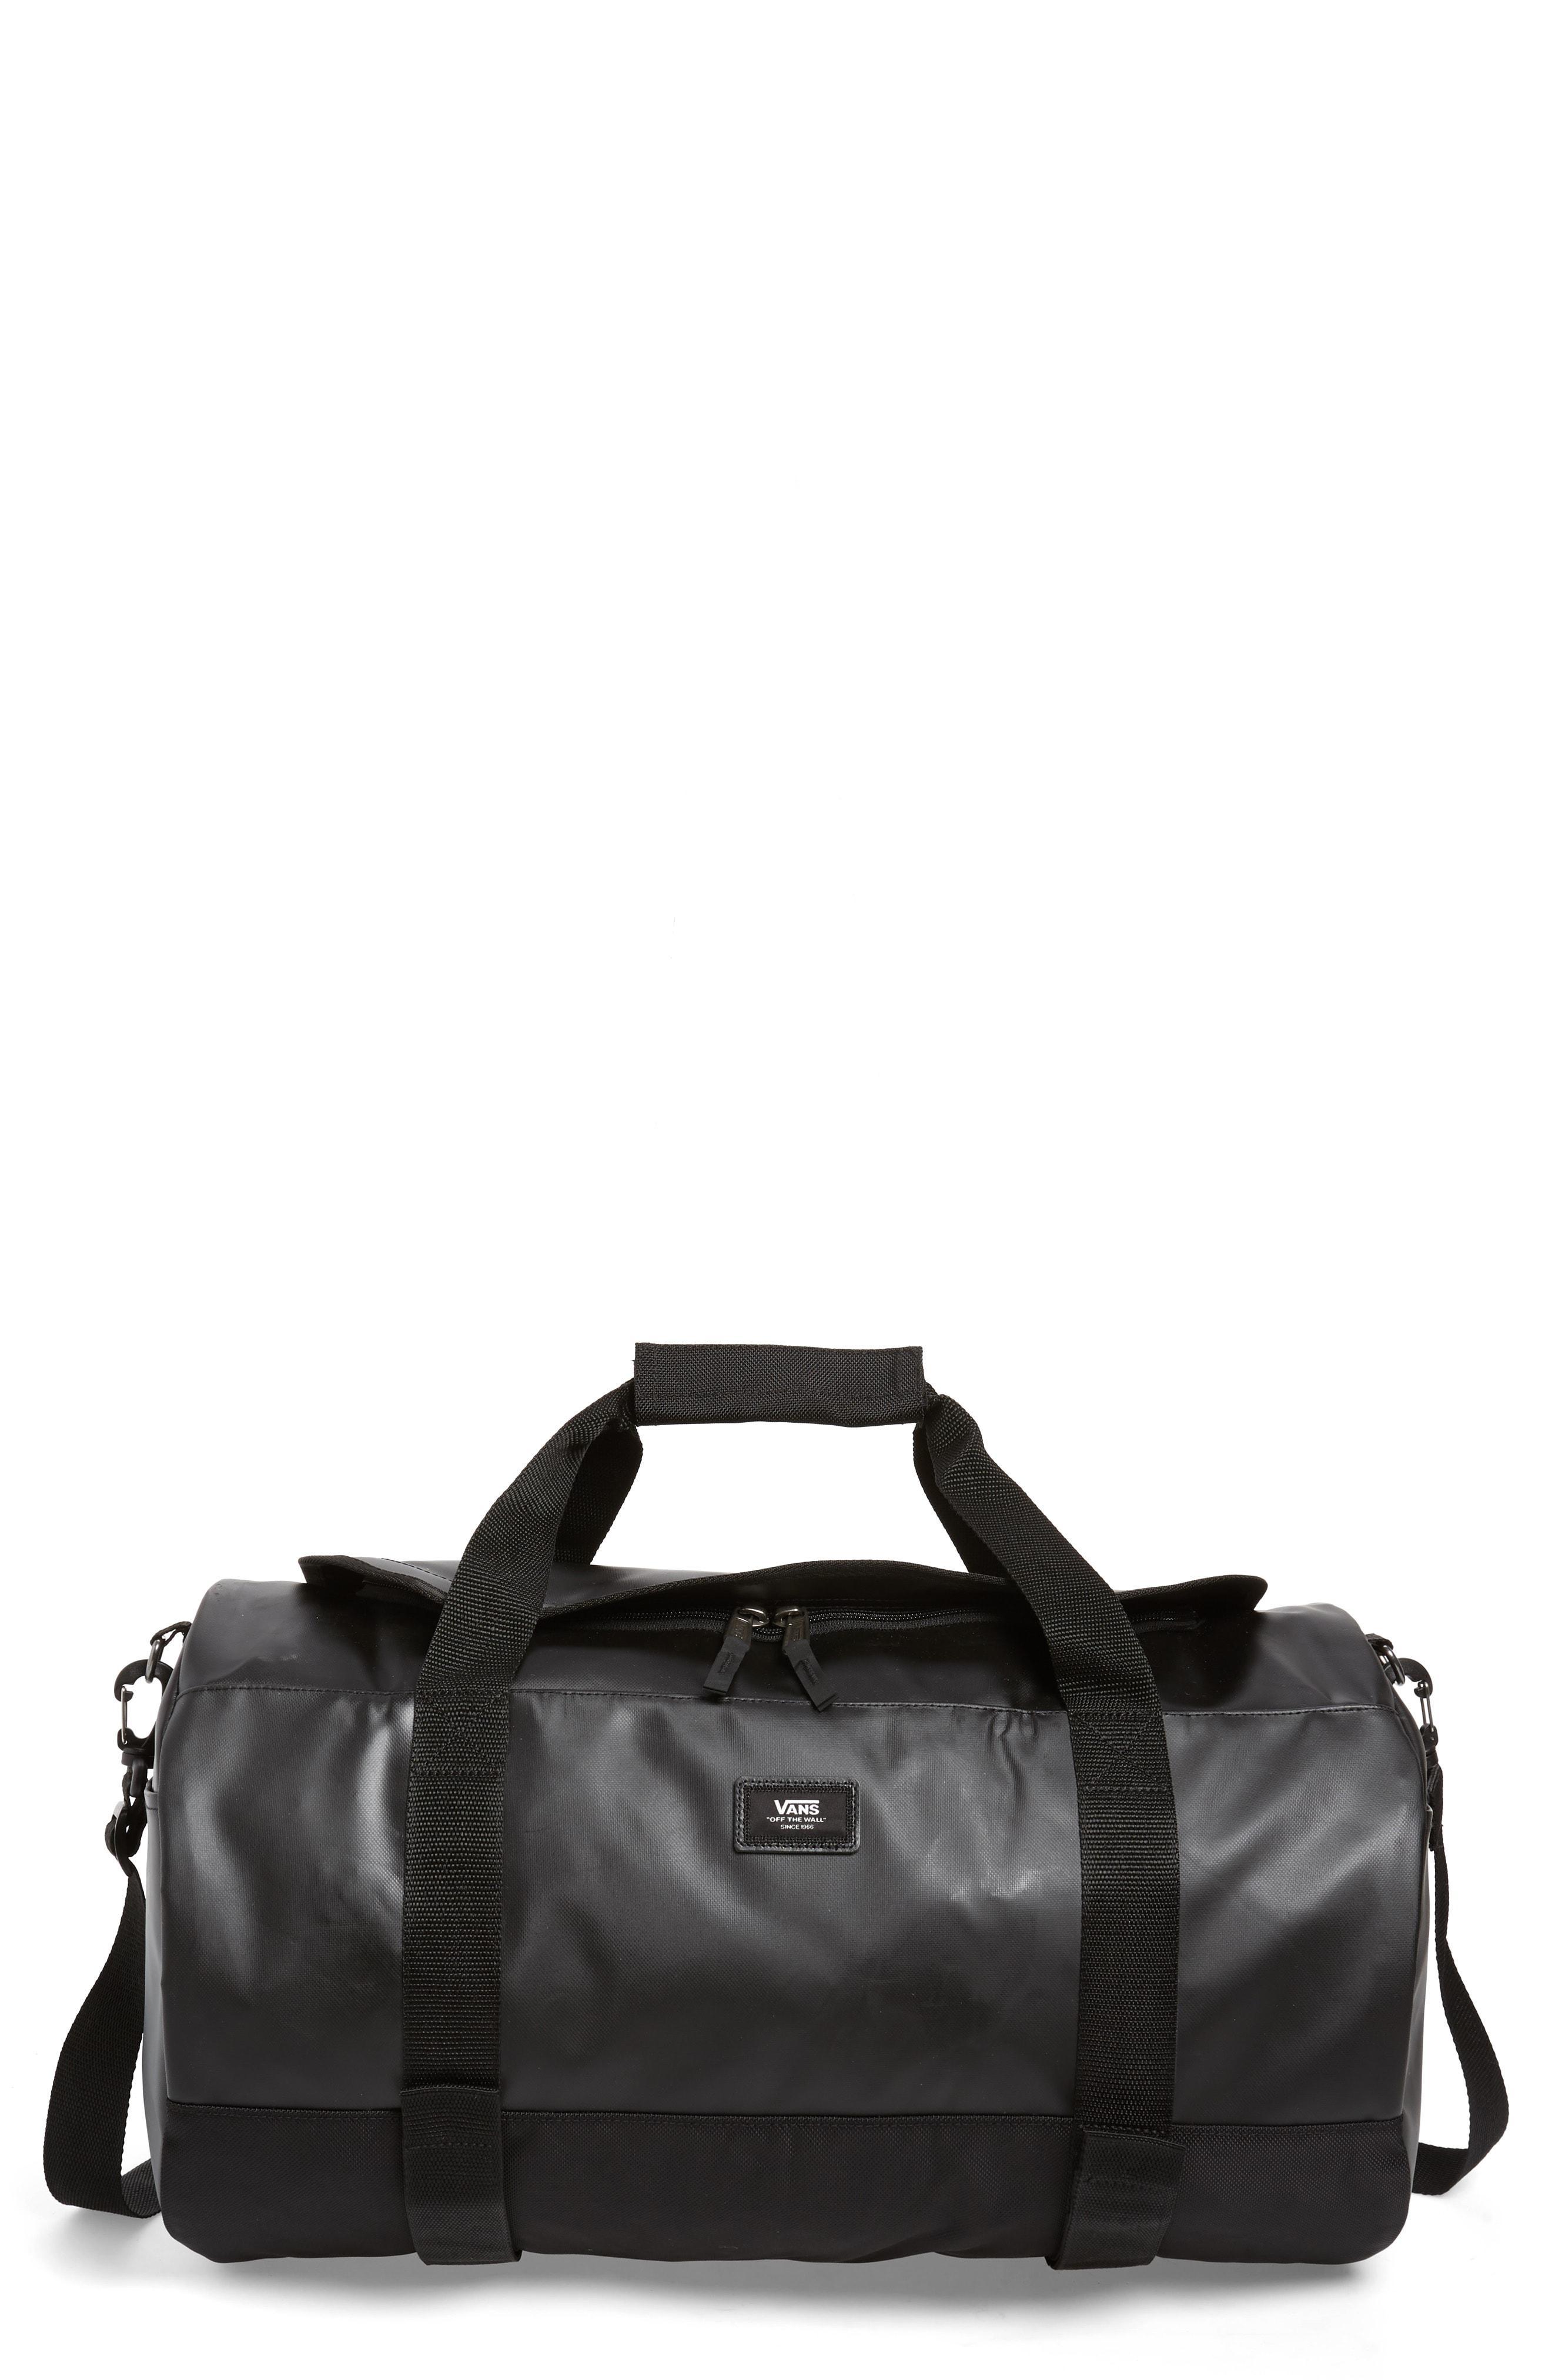 f8d1635c0e42 Vans - Black Grind Skate Water Resistant Duffel Bag - for Men - Lyst. View  fullscreen